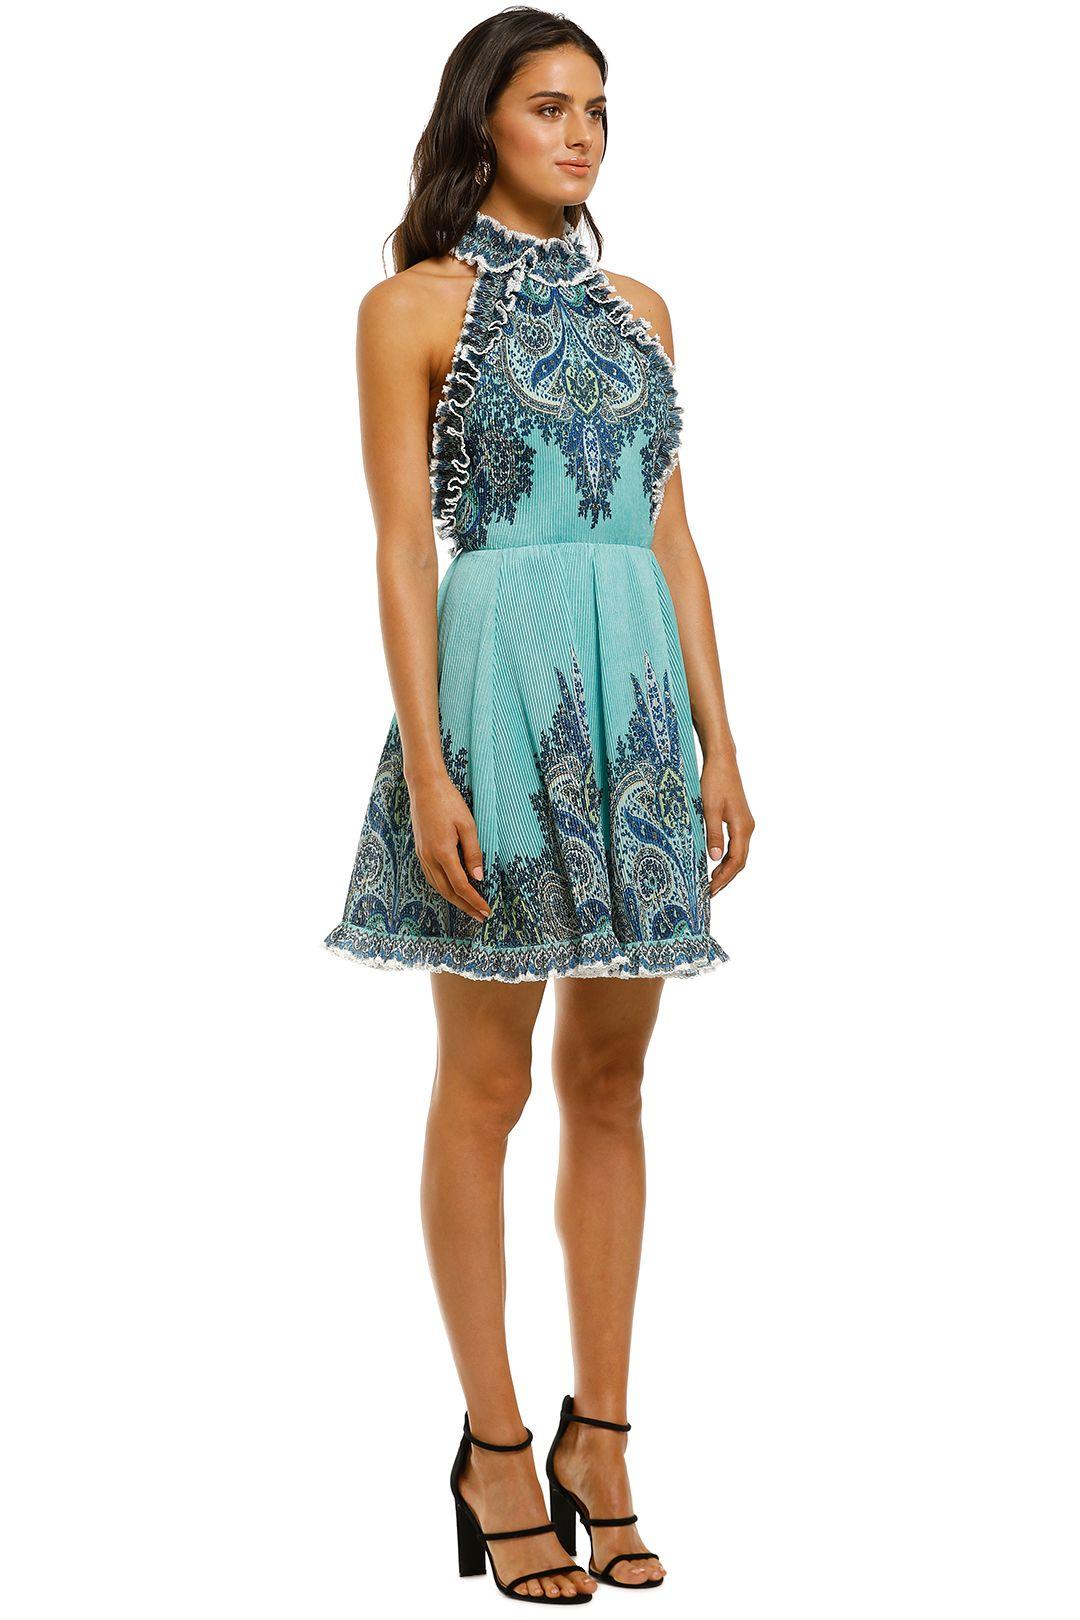 Zimmermann-Moncur-Ruffle-Neck-Mini-Dress-Aqua-Paisley-Side